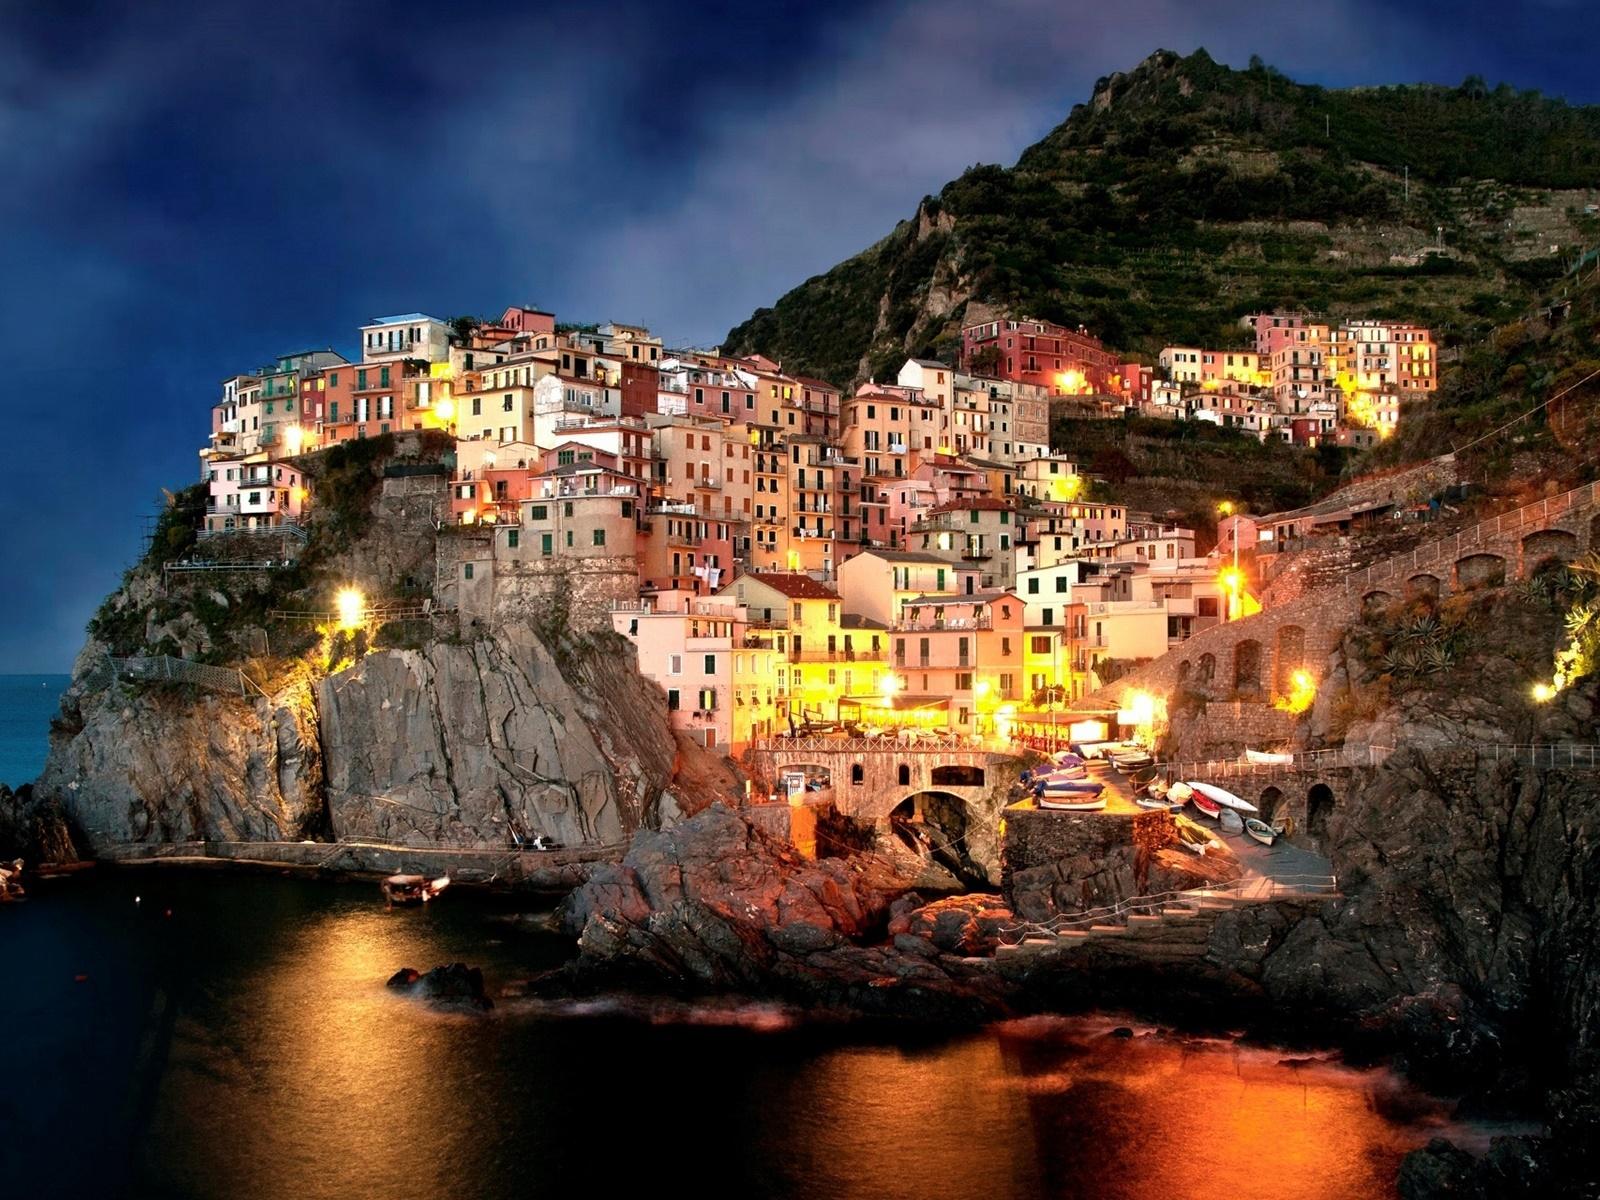 italien amalfitanische küste